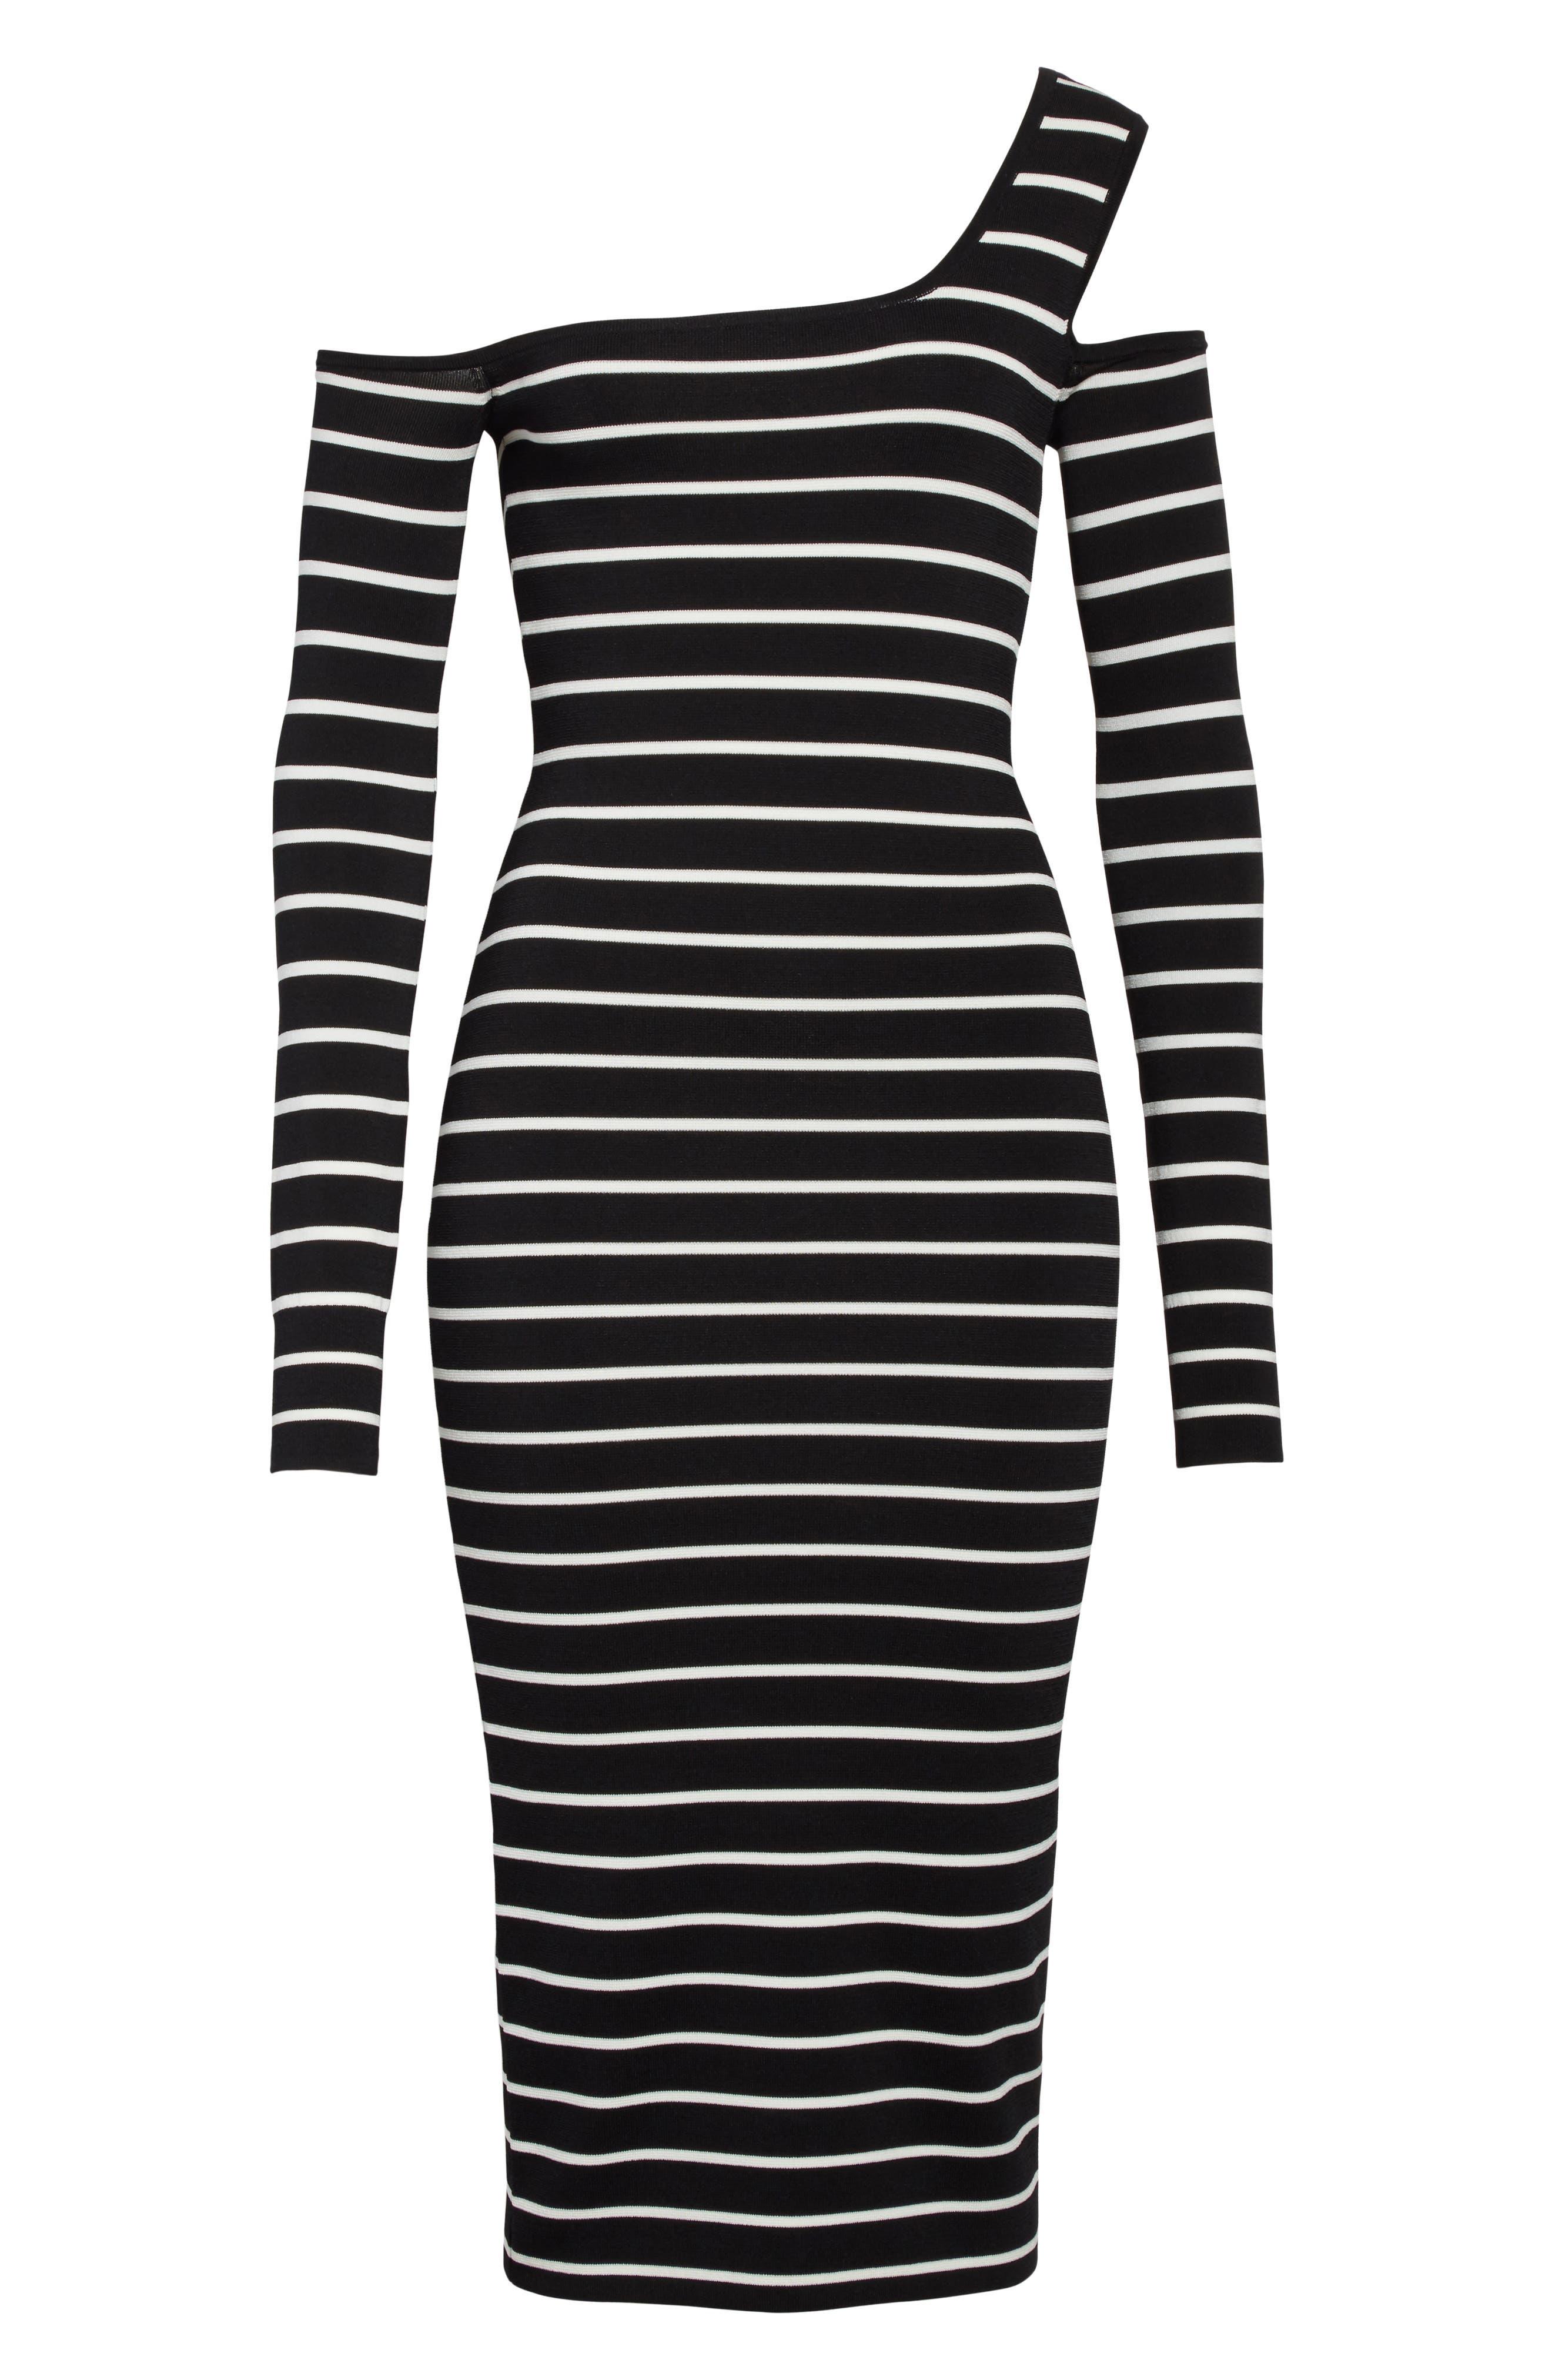 Emerald One-Shoulder Dress,                             Alternate thumbnail 6, color,                             Black/ White